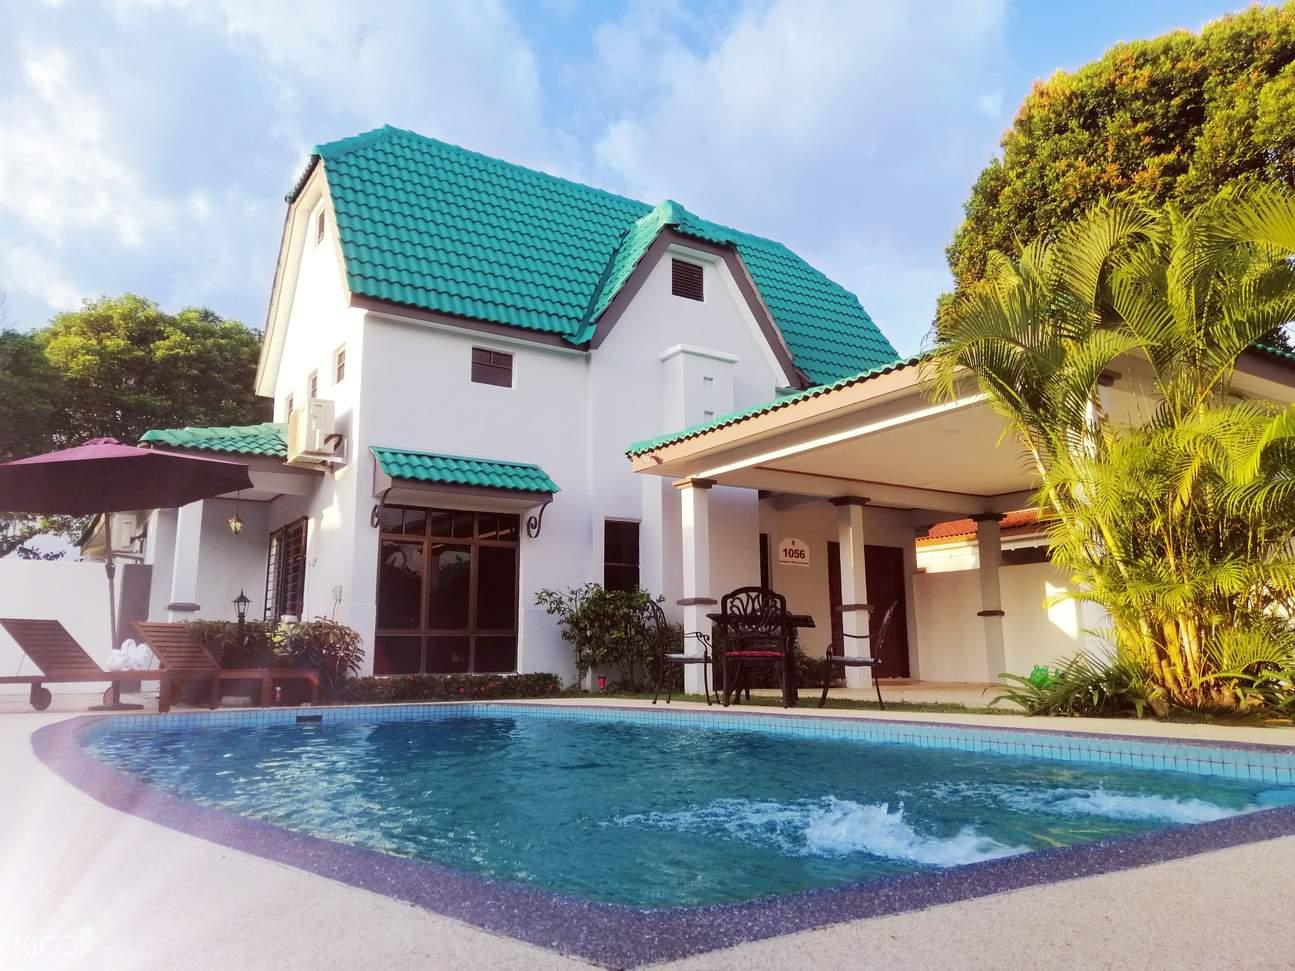 Enjoy your family vacation here at A'Famosa Resort Villa